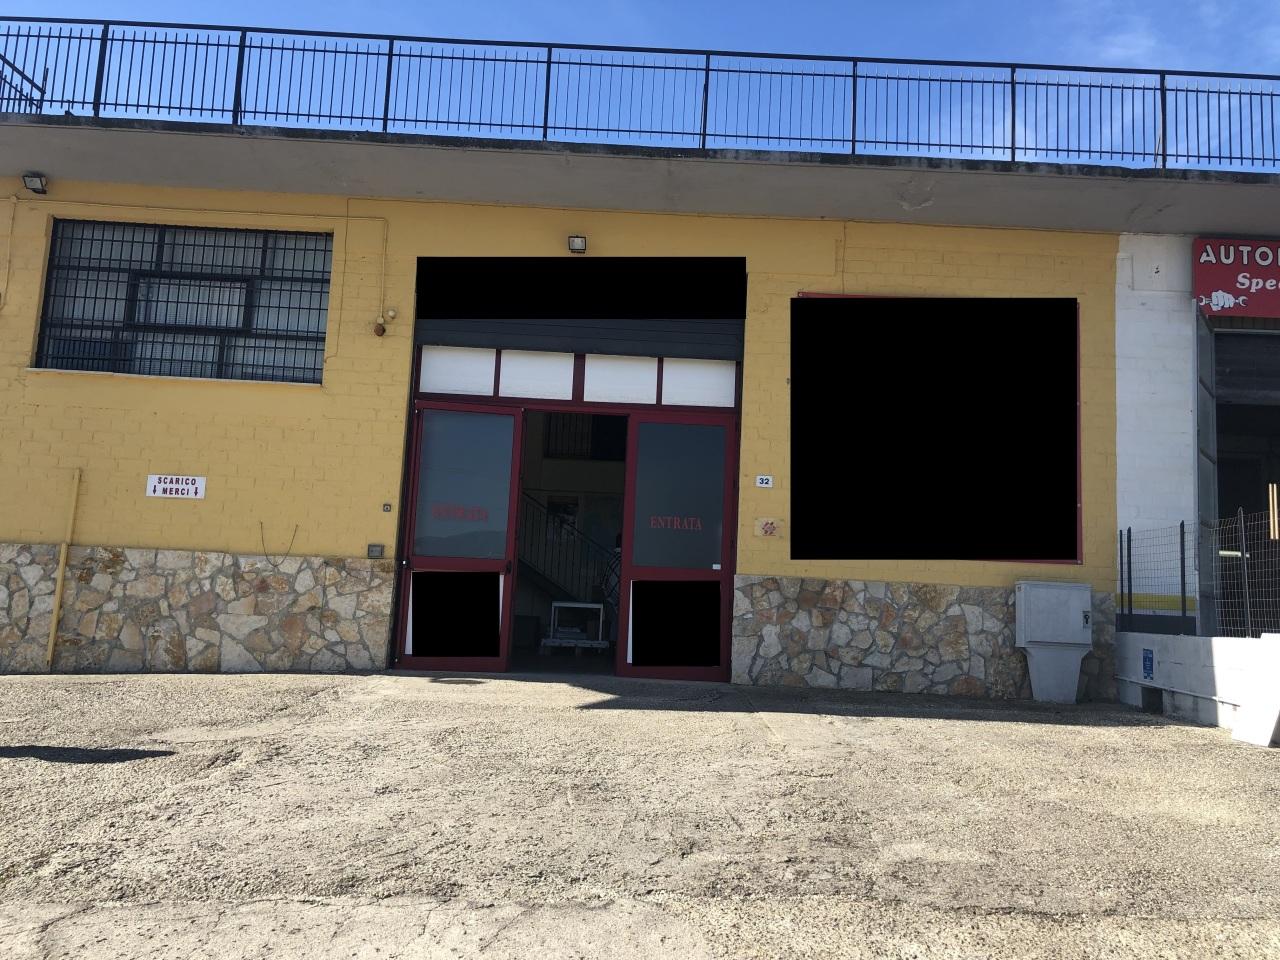 Capannone / Fondo - Industriale/Artigianale a Mentana Rif. 9605609